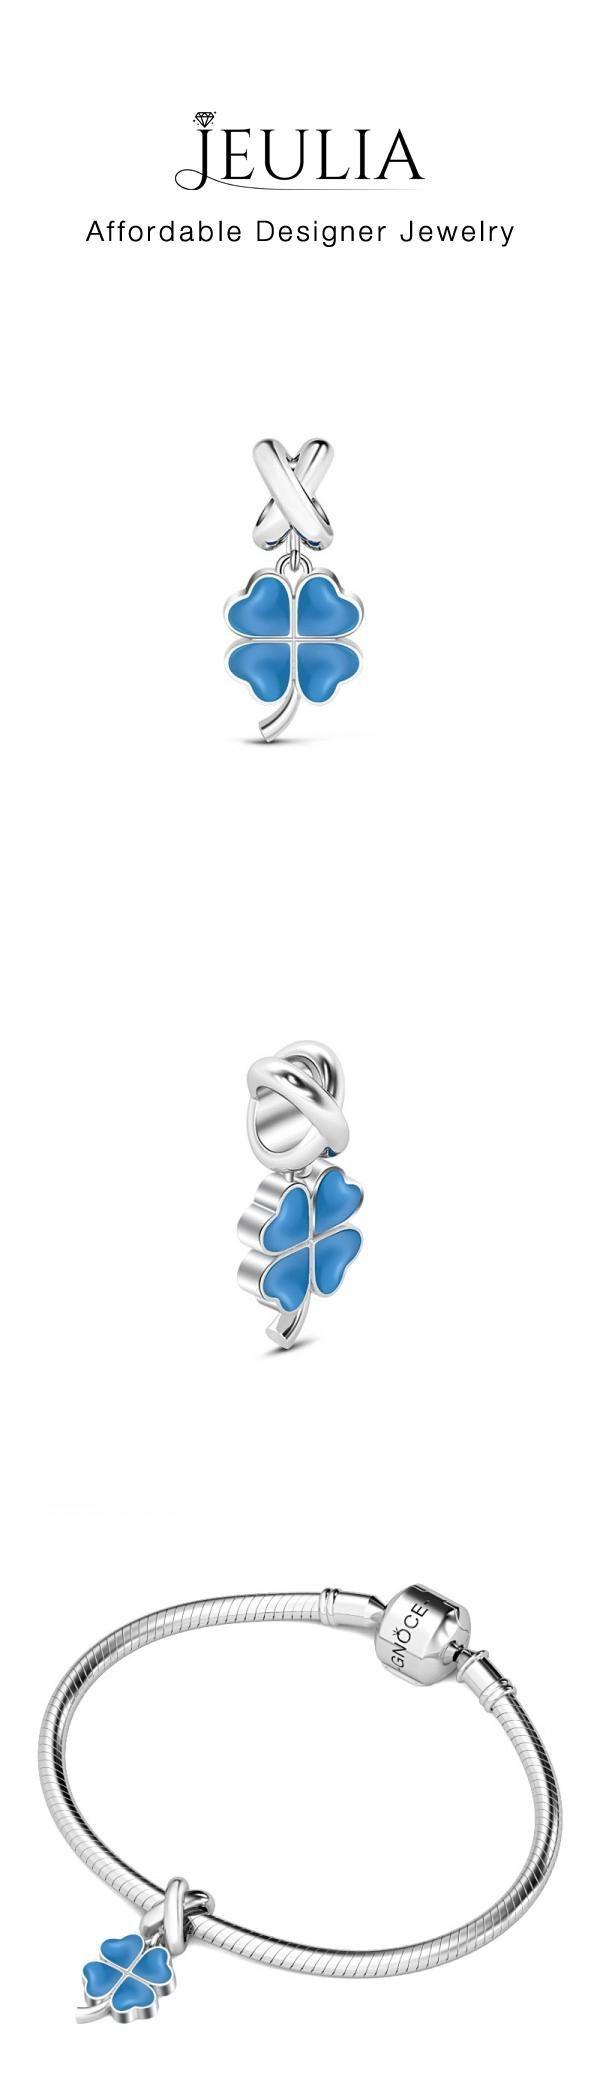 #Jeulia JEULIA Four-leaf Clover Pendant Sterling Silver. Discover more stunning Nature from Jeulia.com. Shop Now!